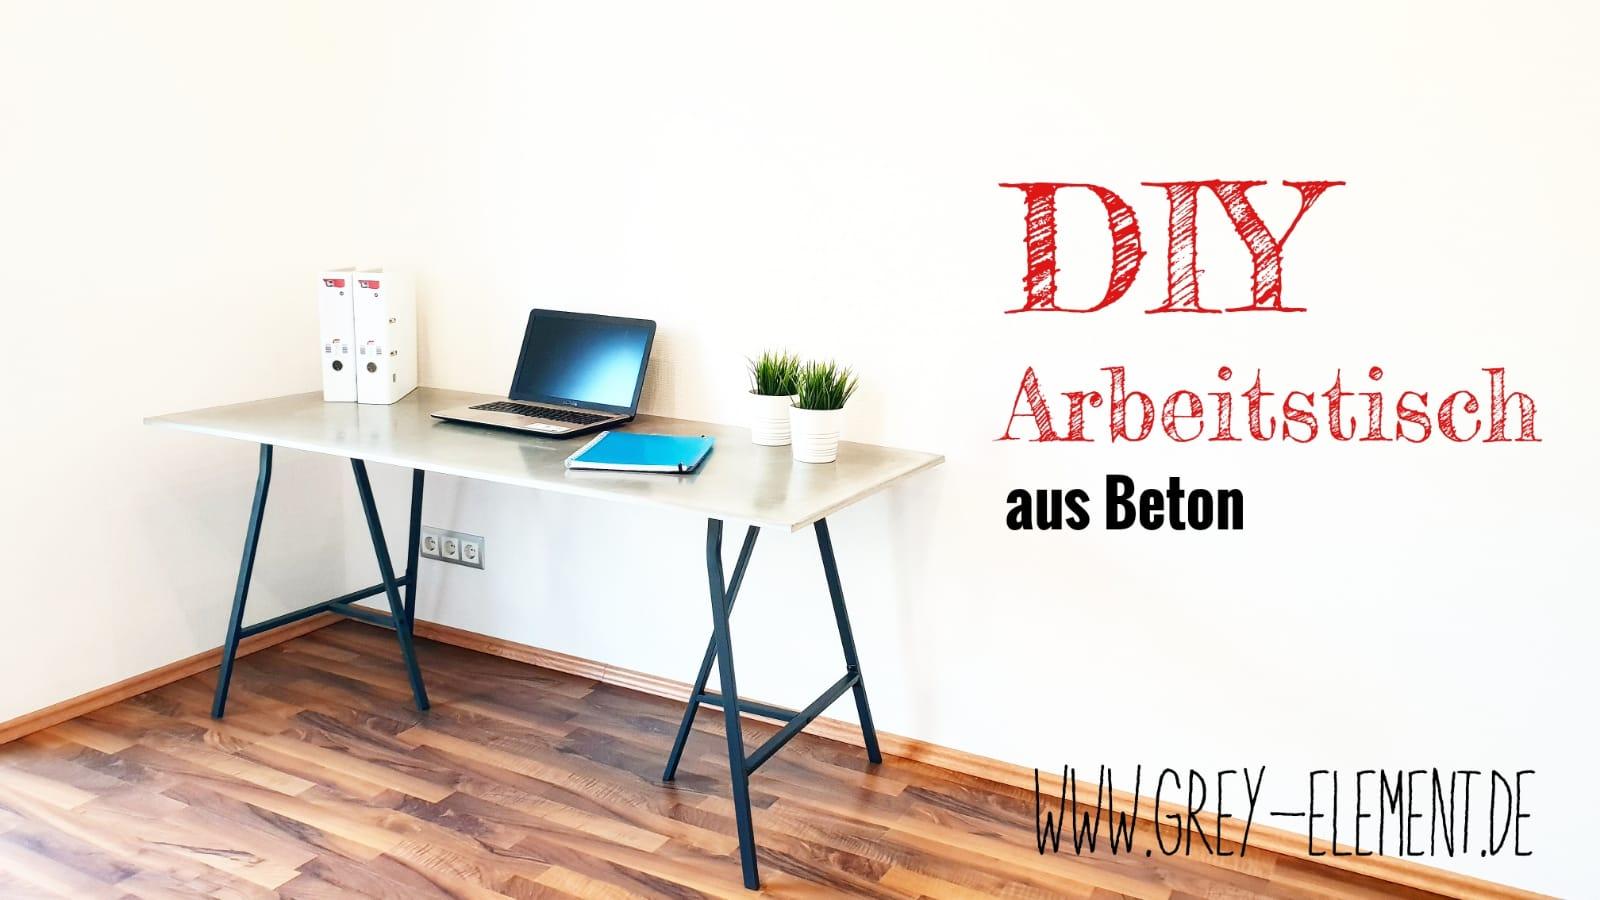 Turbo Tisch aus Beton selber machen - DIY Betonmöbel - Betonmöbel OM96